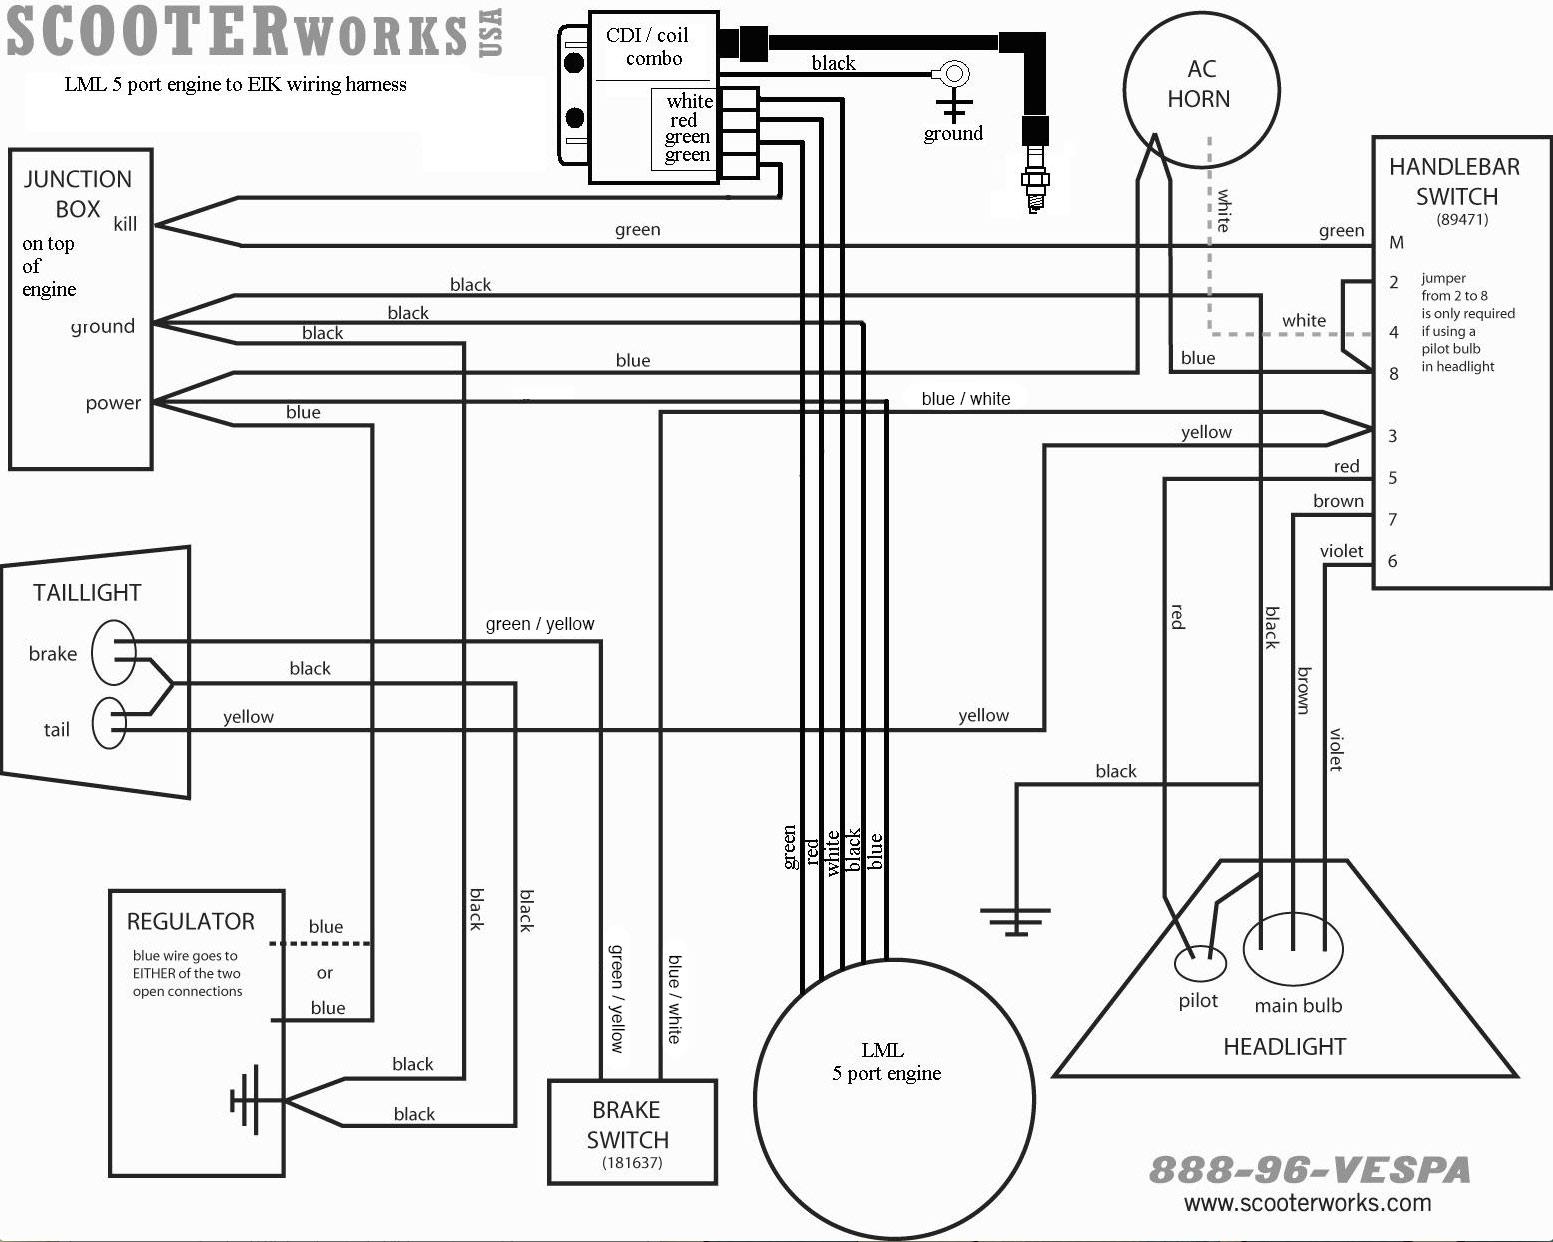 LML_5_port_engine_to_EIK_harness?resize\=665%2C532\&ssl\=1 taotao 50cc scooter wiring diagram headlight taotao wiring tao tao 50 scooter wiring diagram at nearapp.co